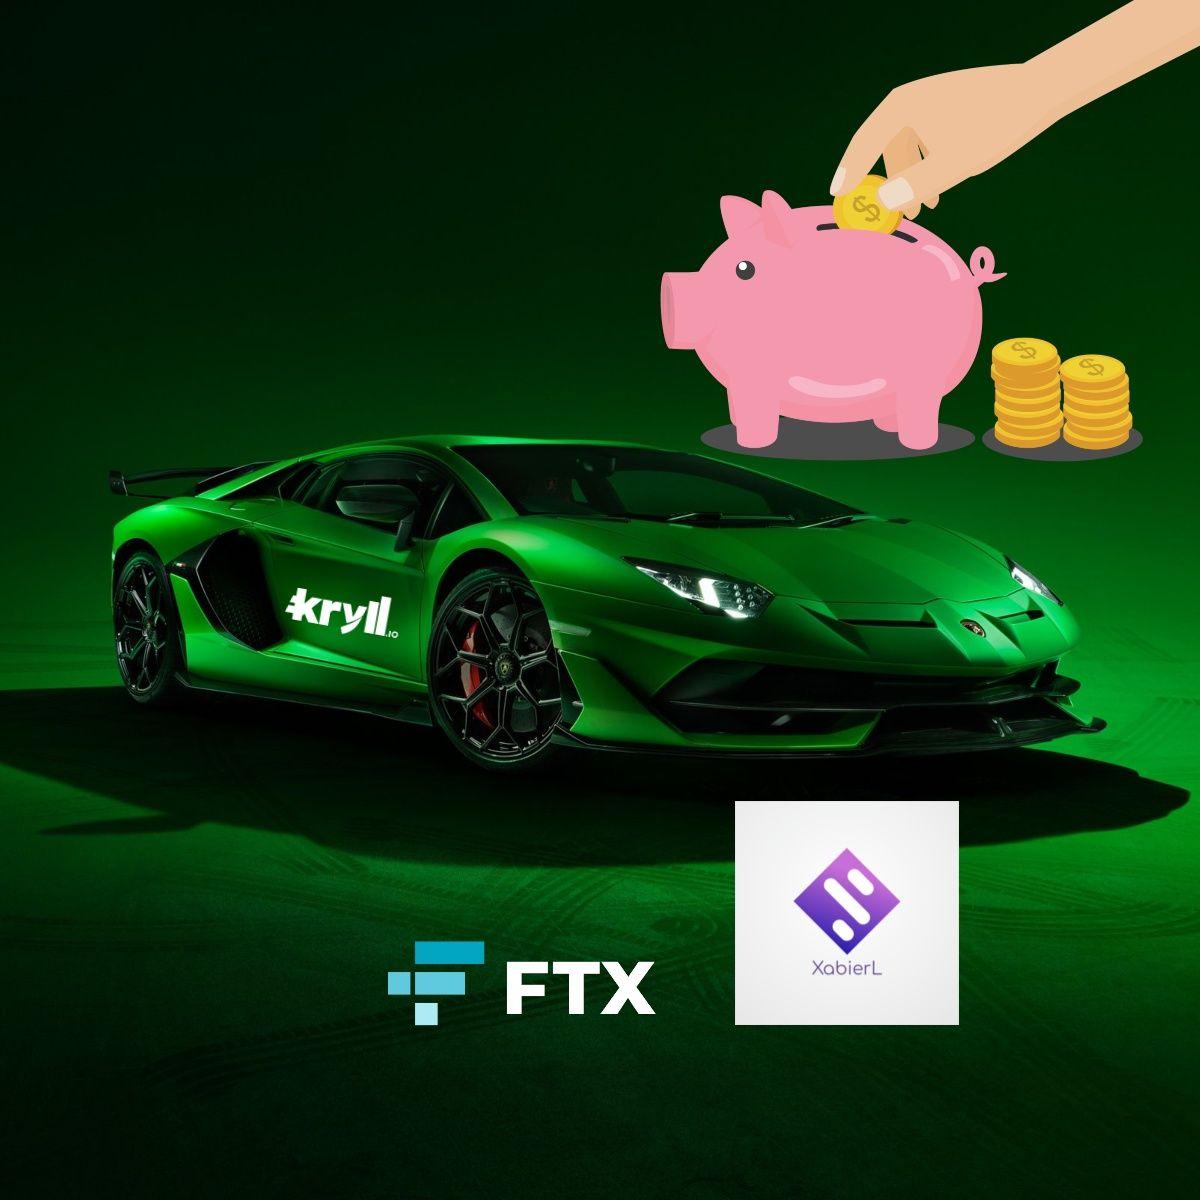 FACU FTX VERSION PIGGY Kryll strategy poster